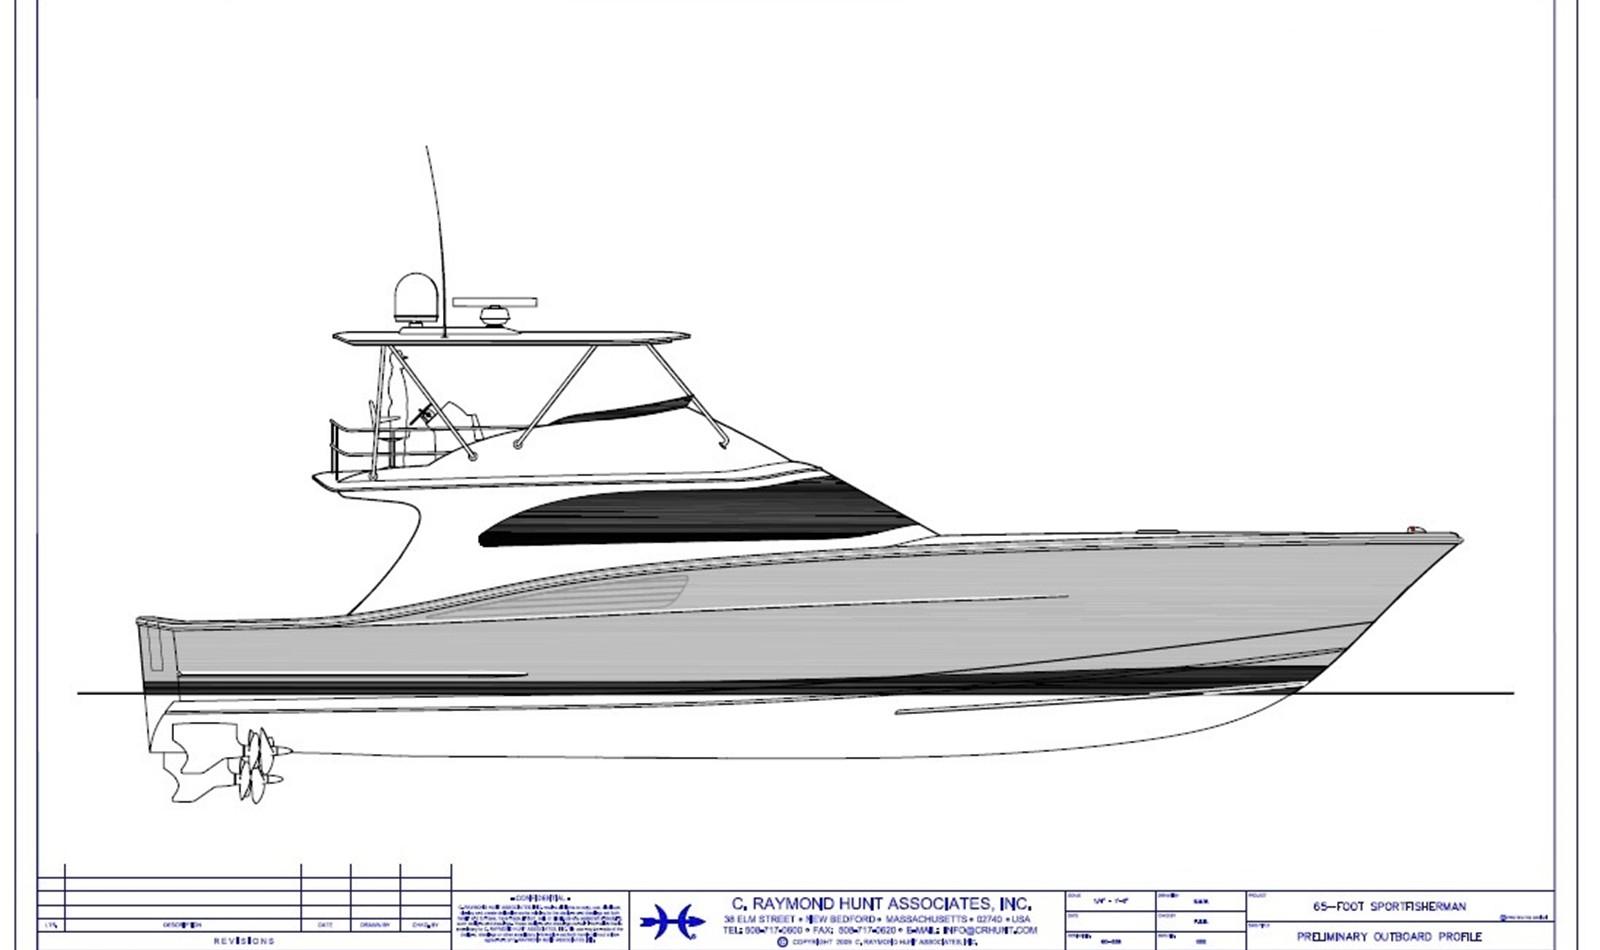 Custom Yacht Design - 65 ft. Custom Sportfish - C. Raymond Hunt Associates